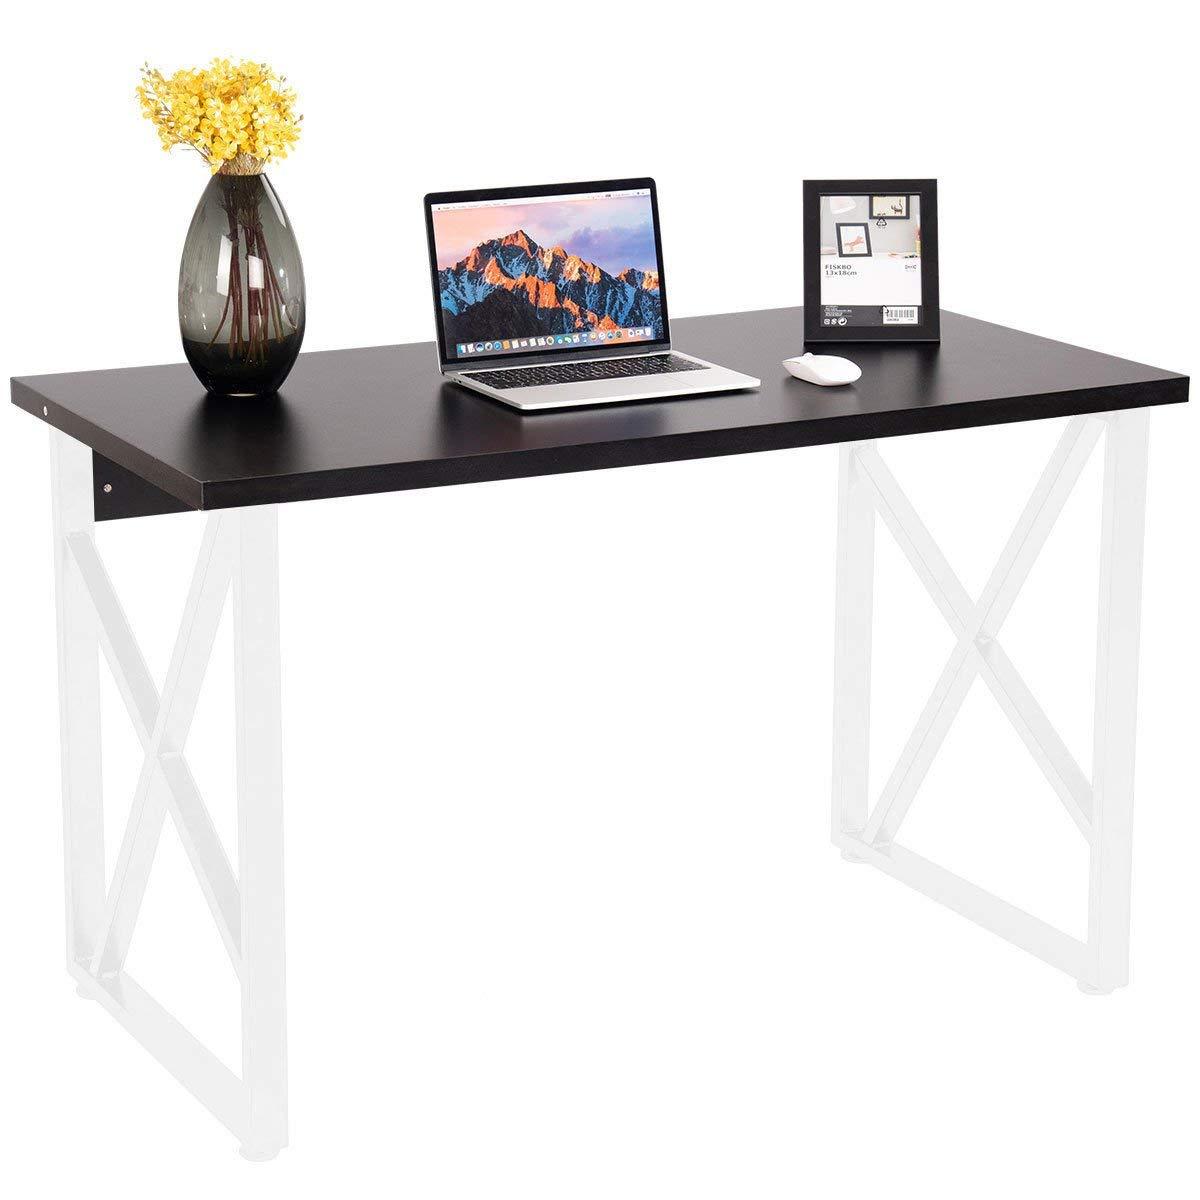 ShopForAllYou Desk Table Office Computer Desk PC Laptop Table Metal Leg Writing Study Workstation Home Office